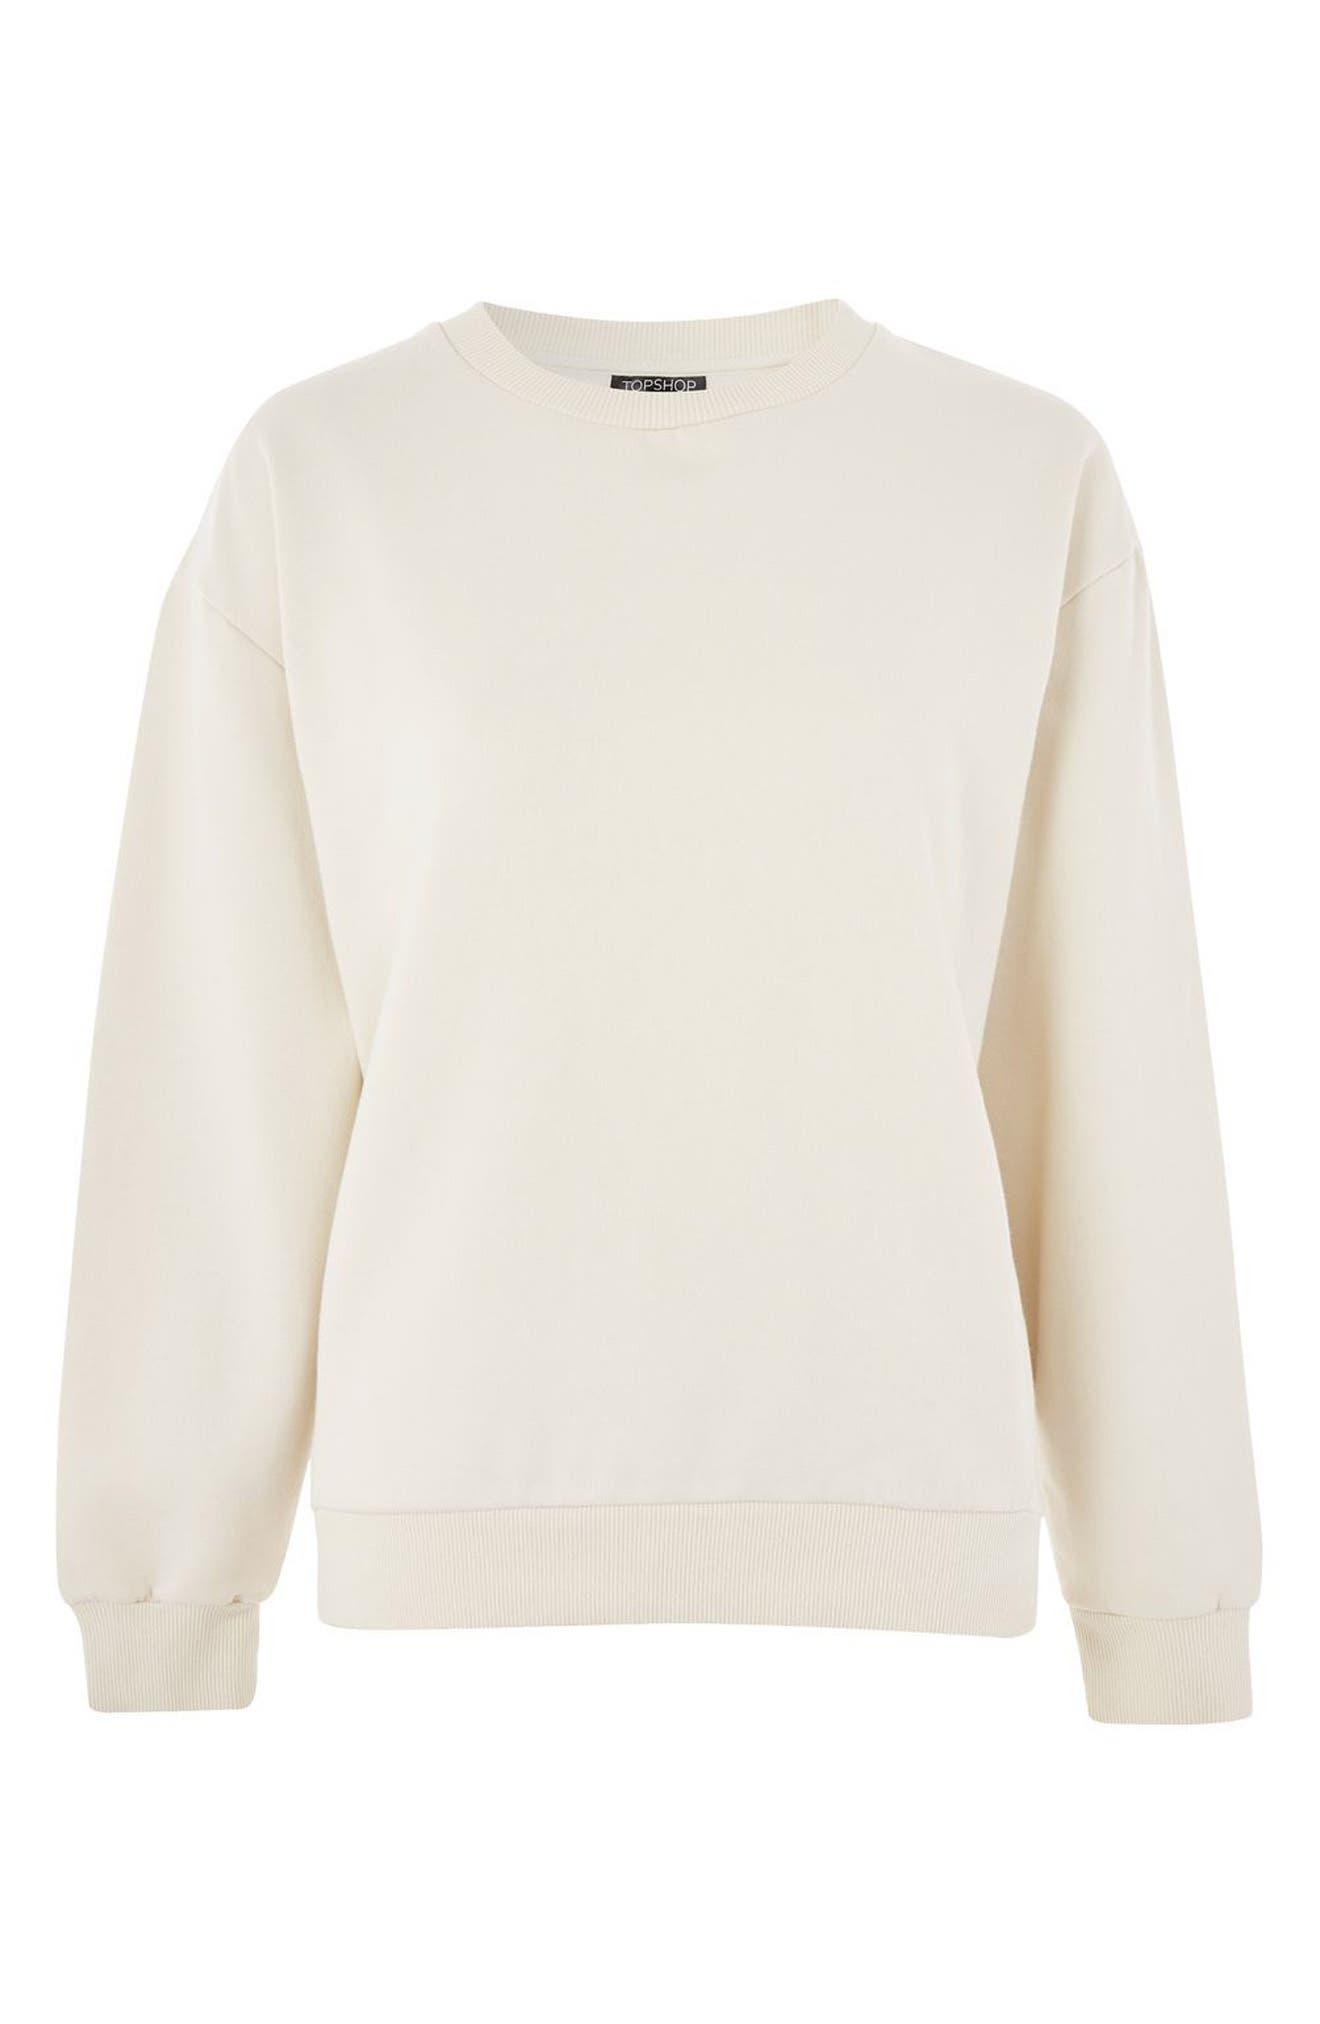 Sloppy Sweatshirt,                             Alternate thumbnail 3, color,                             020